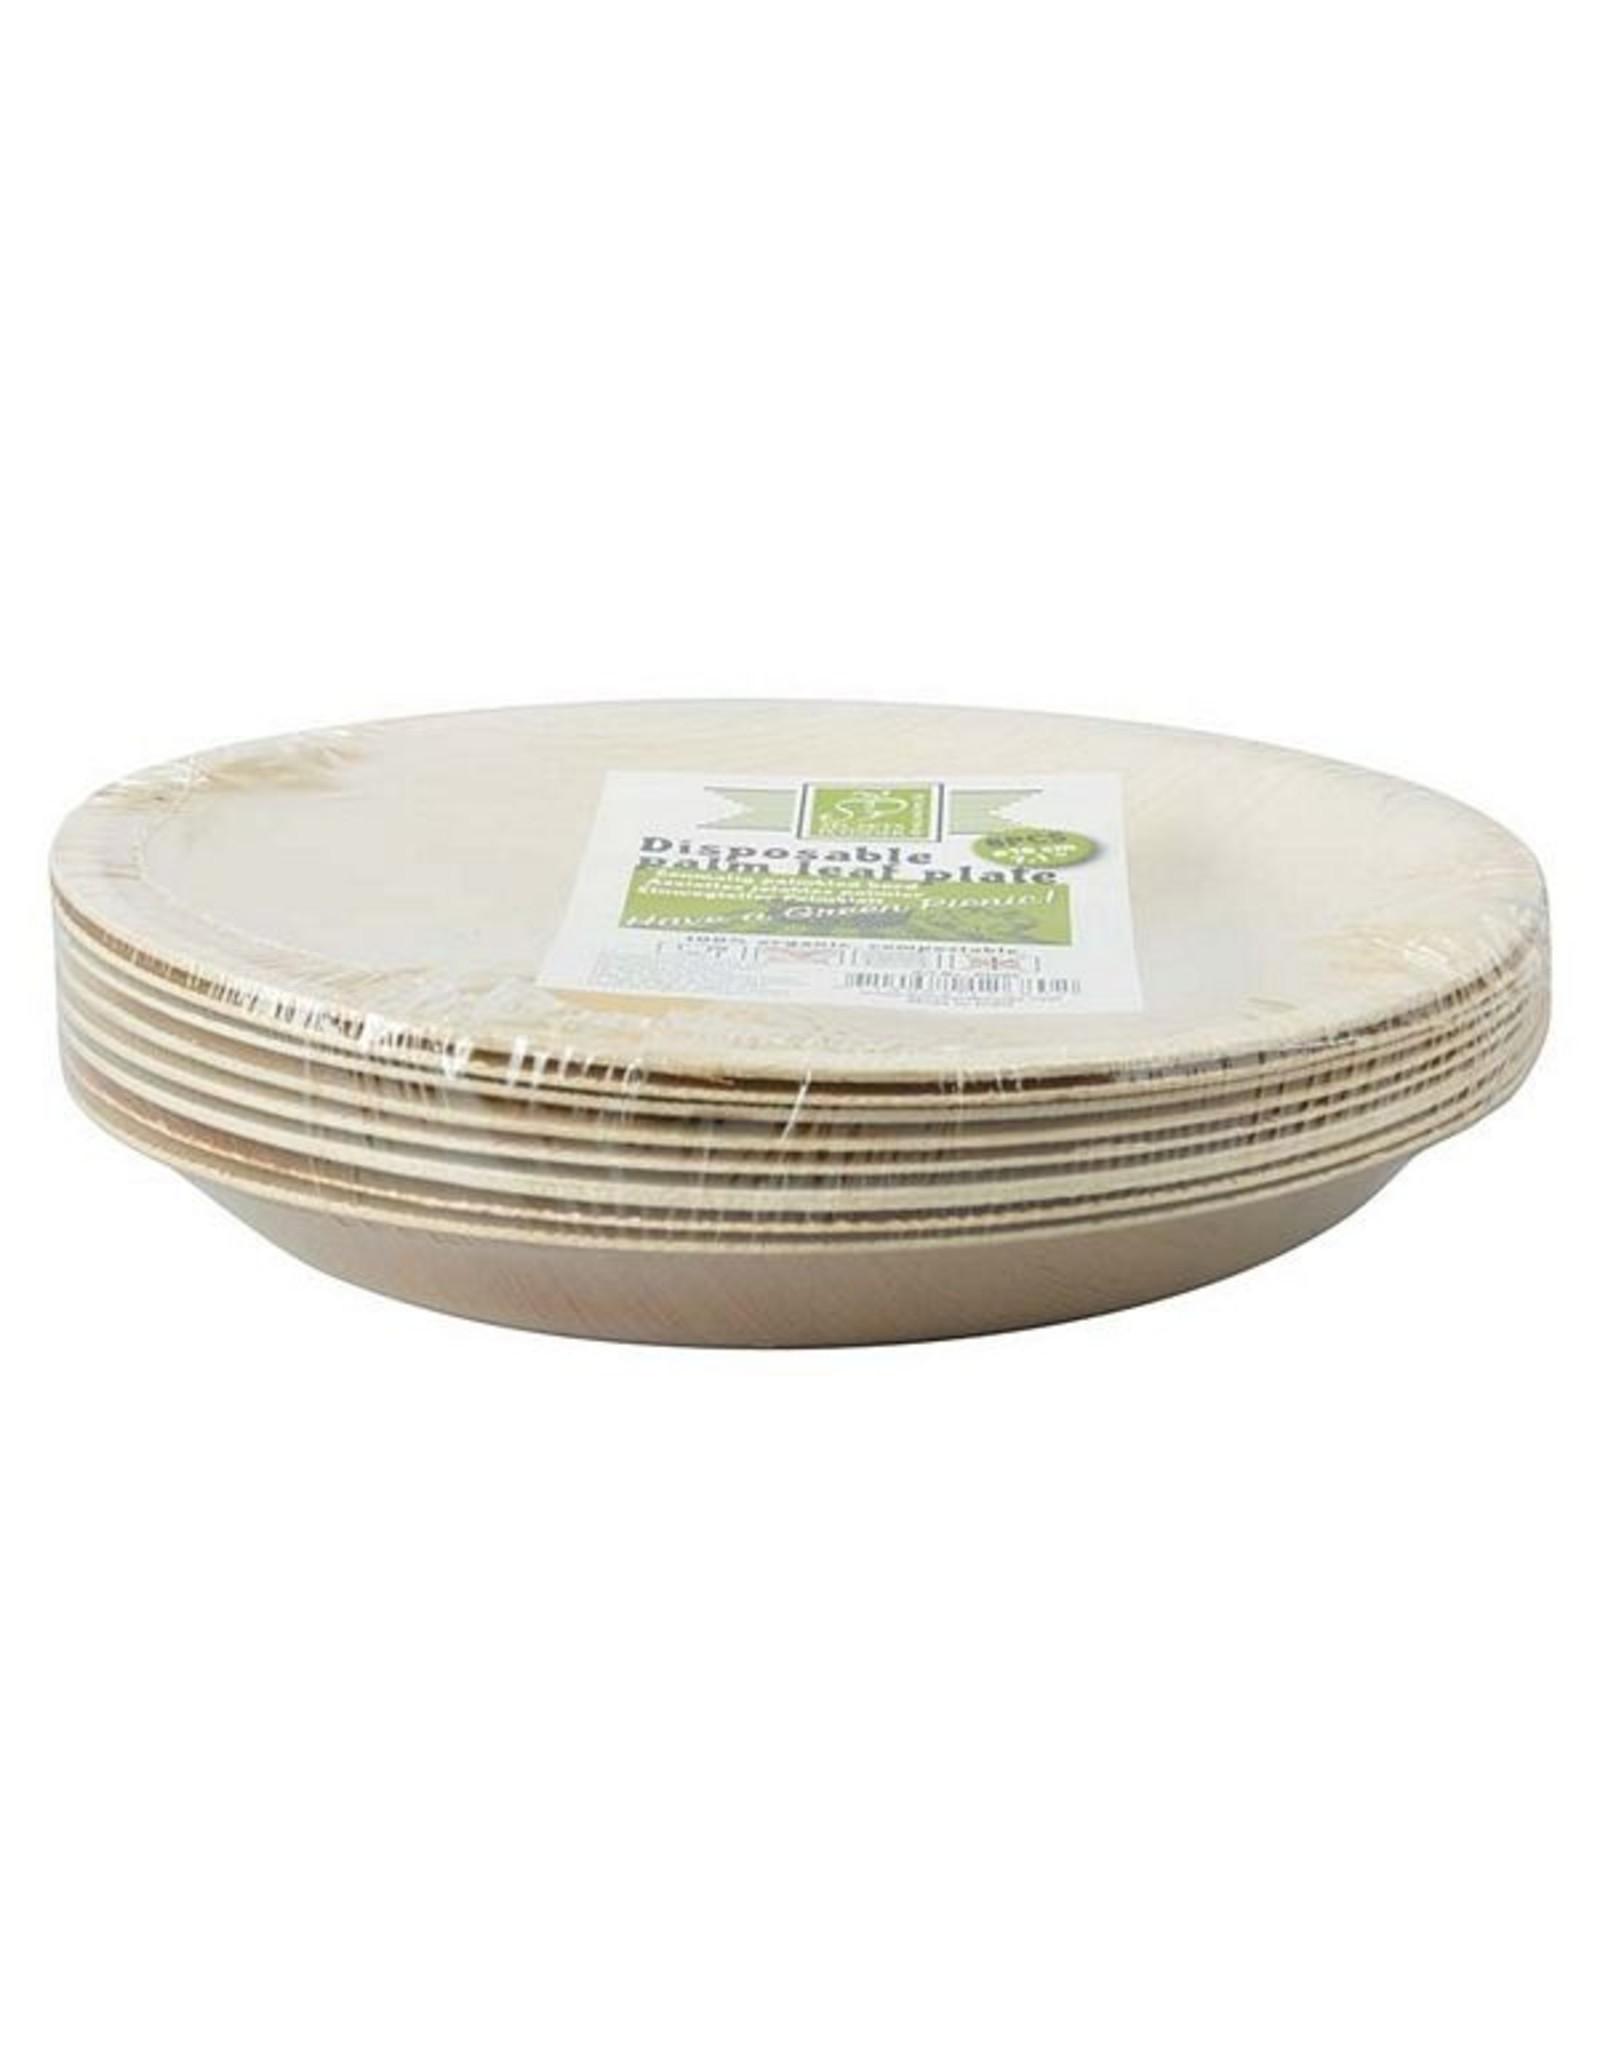 Esschert Disposable palm leaf plate set Small